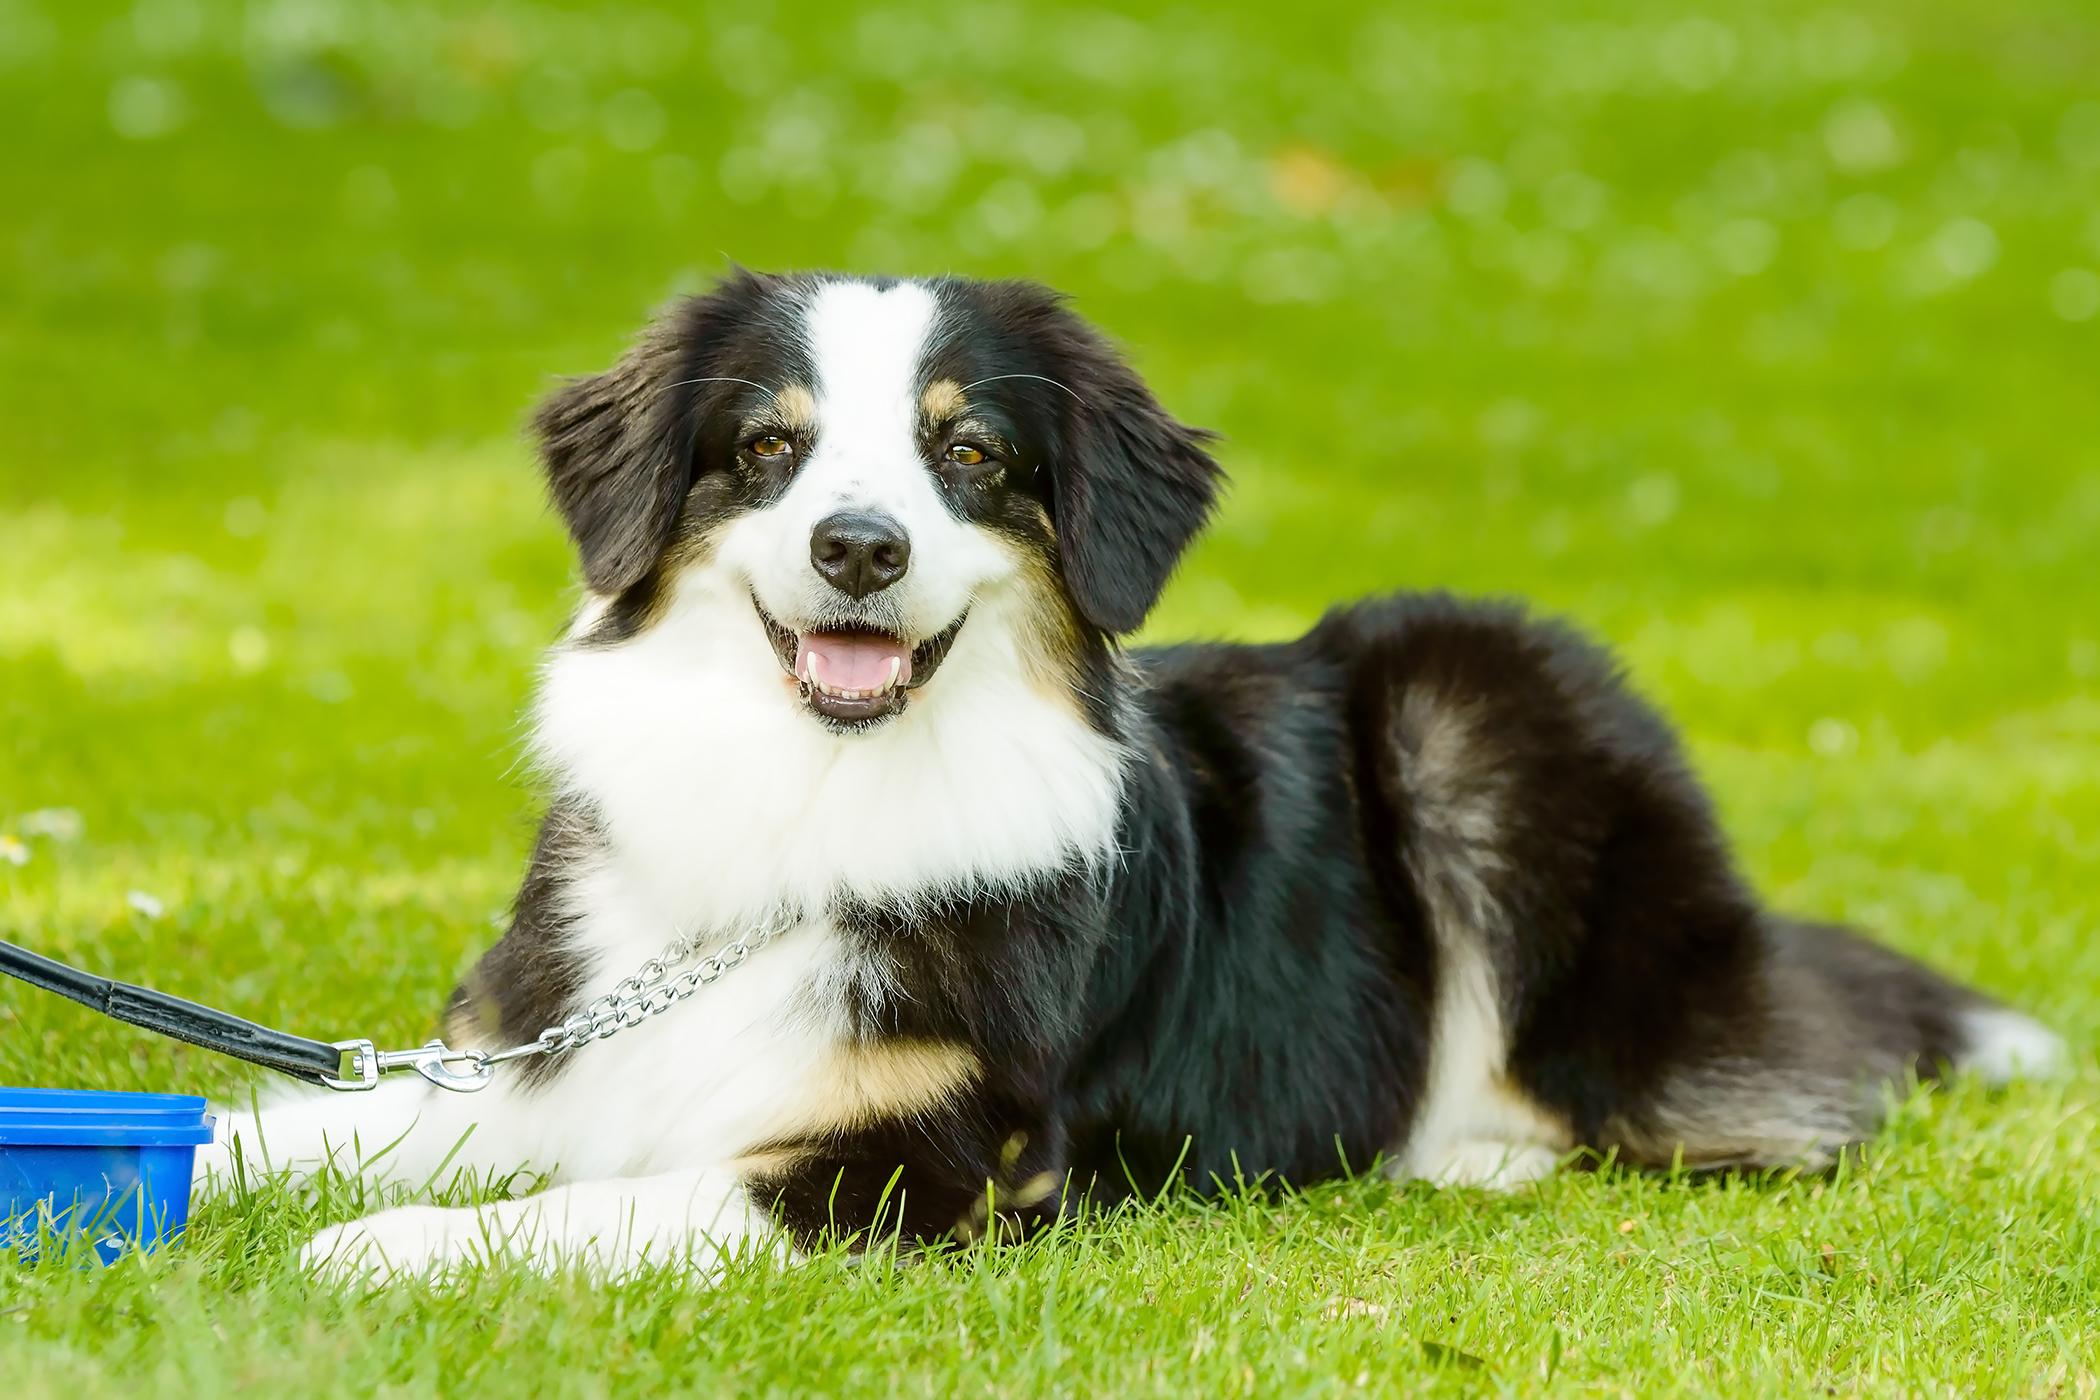 How To Get Dog Bile Out Of Carpet Uk - Carpet Vidalondon